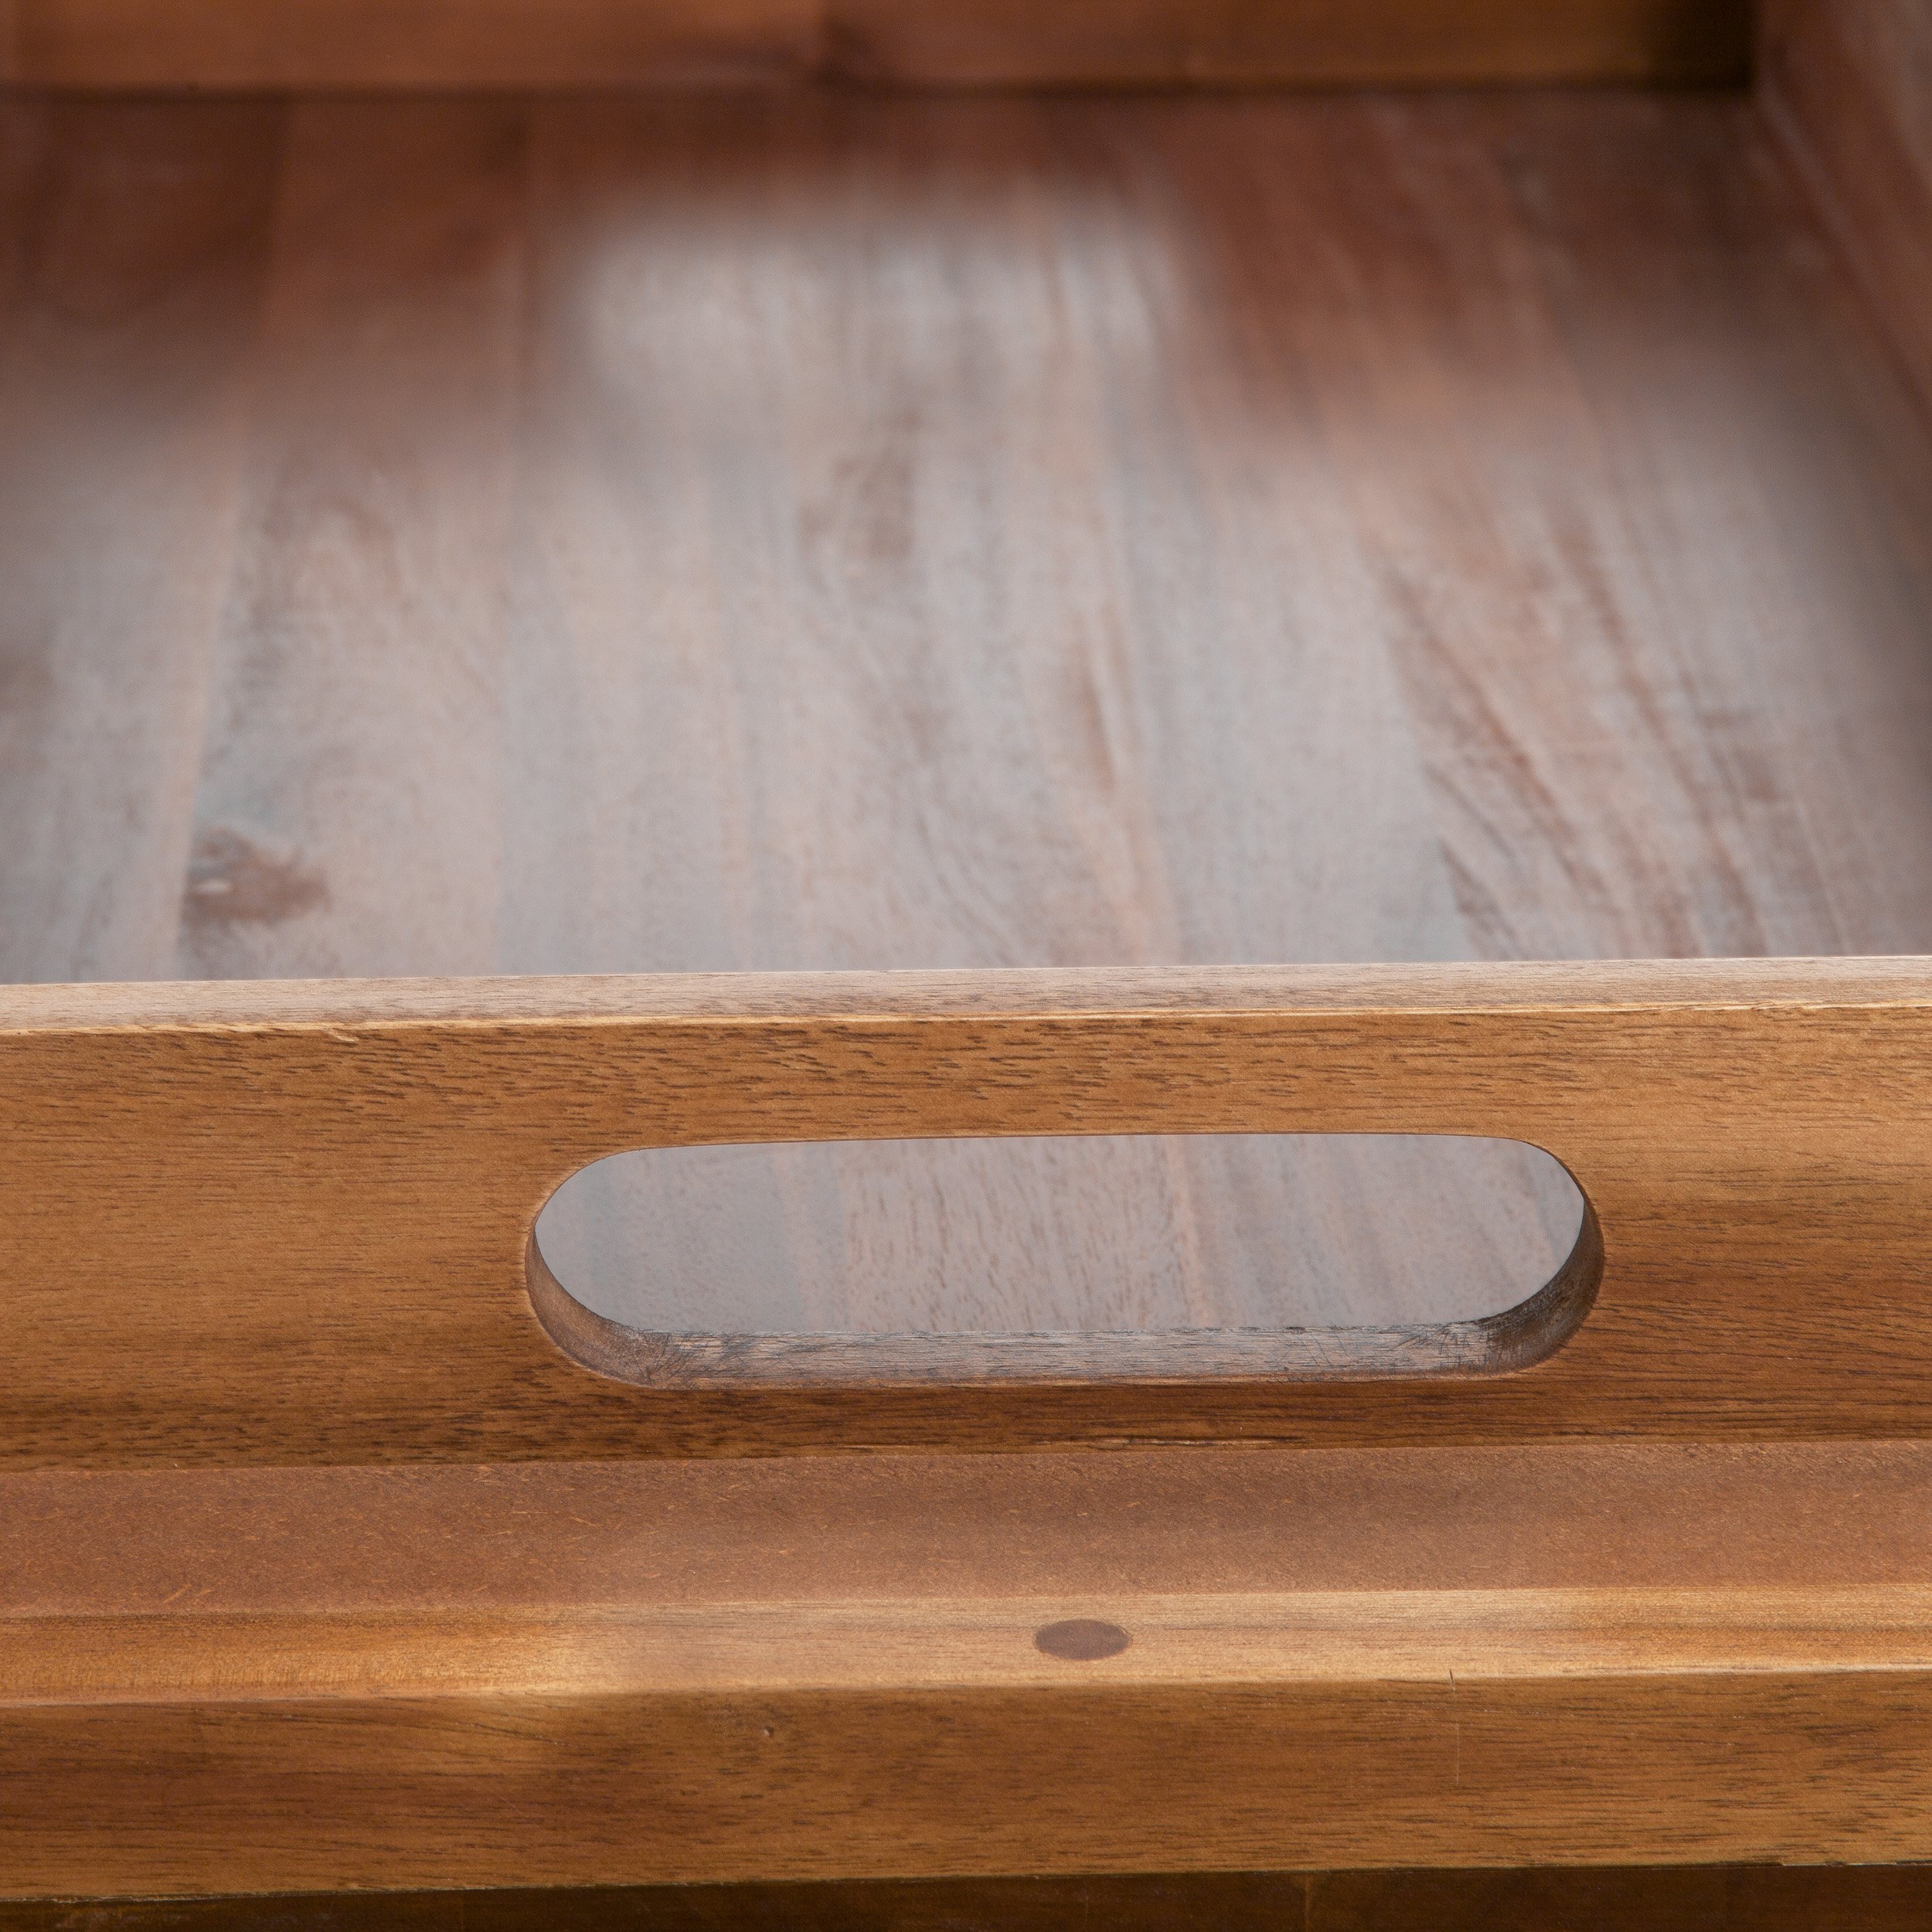 Great Deal Furniture 217178 Northside Acacia Wood Bench Ottoman, Brown by Great Deal Furniture